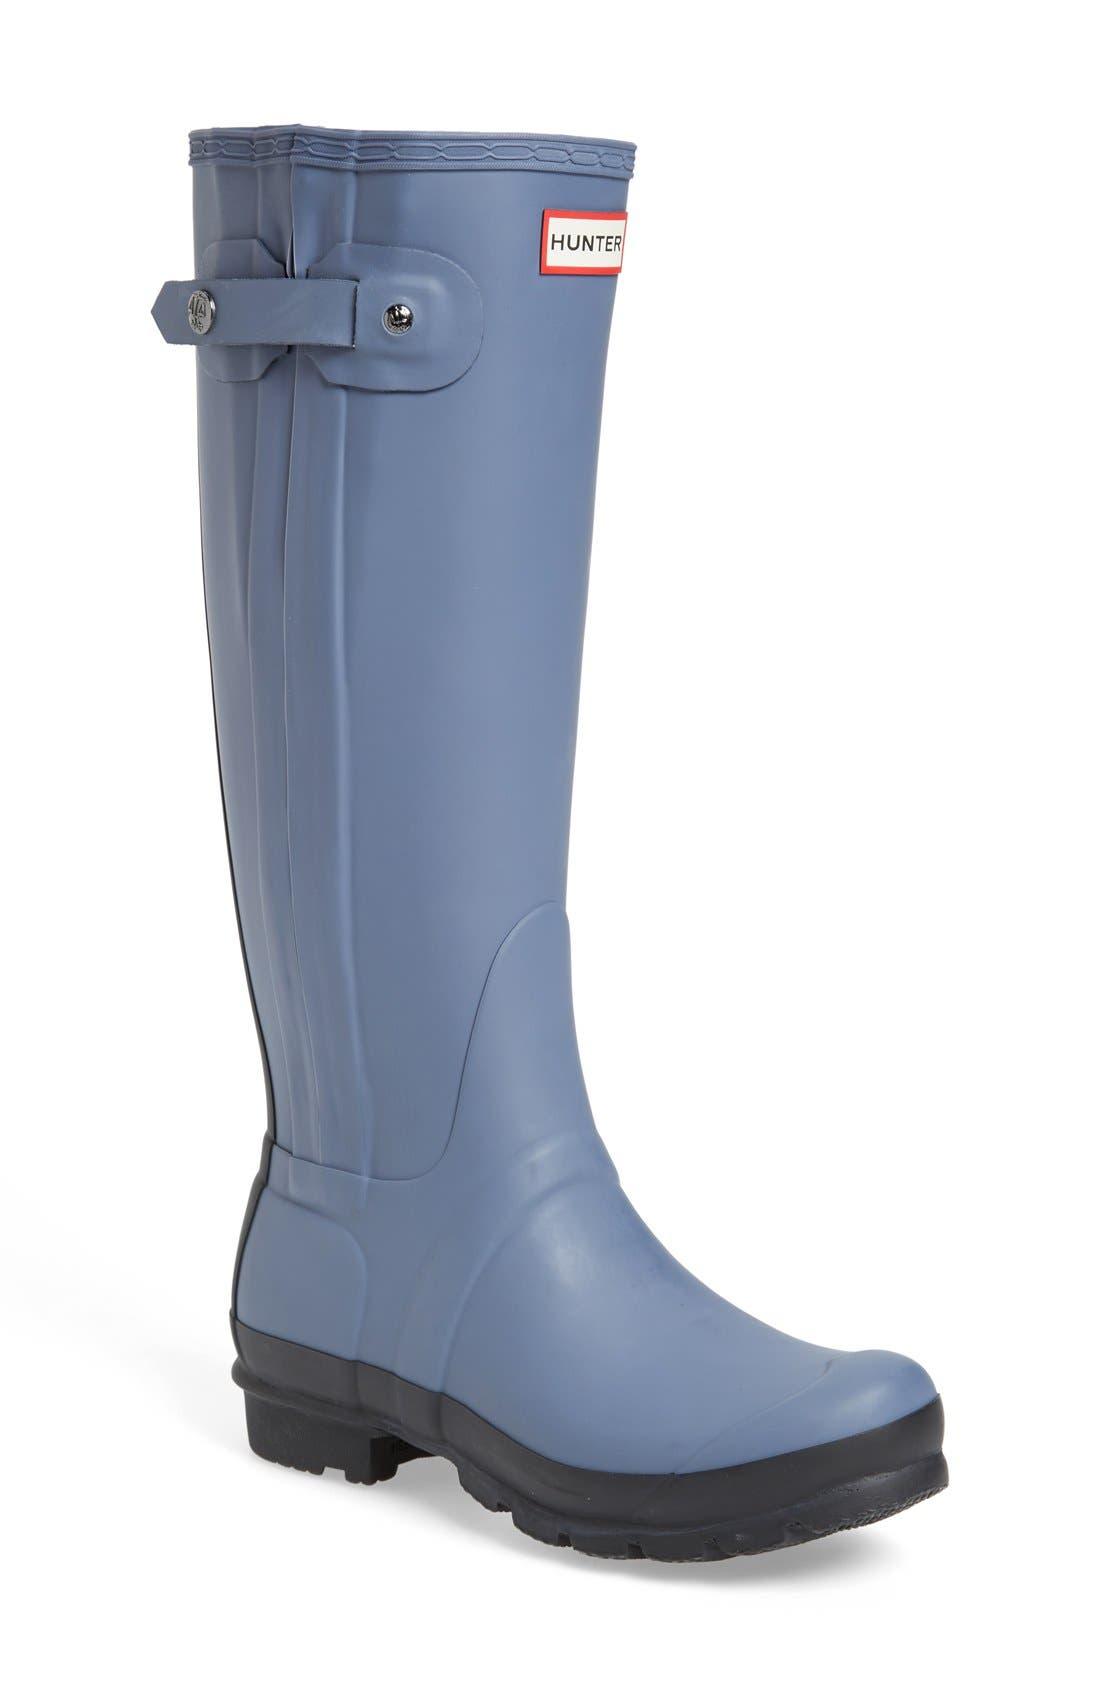 Main Image - Hunter 'Original Slim' Two-Tone Rubber Rain Boot (Women)